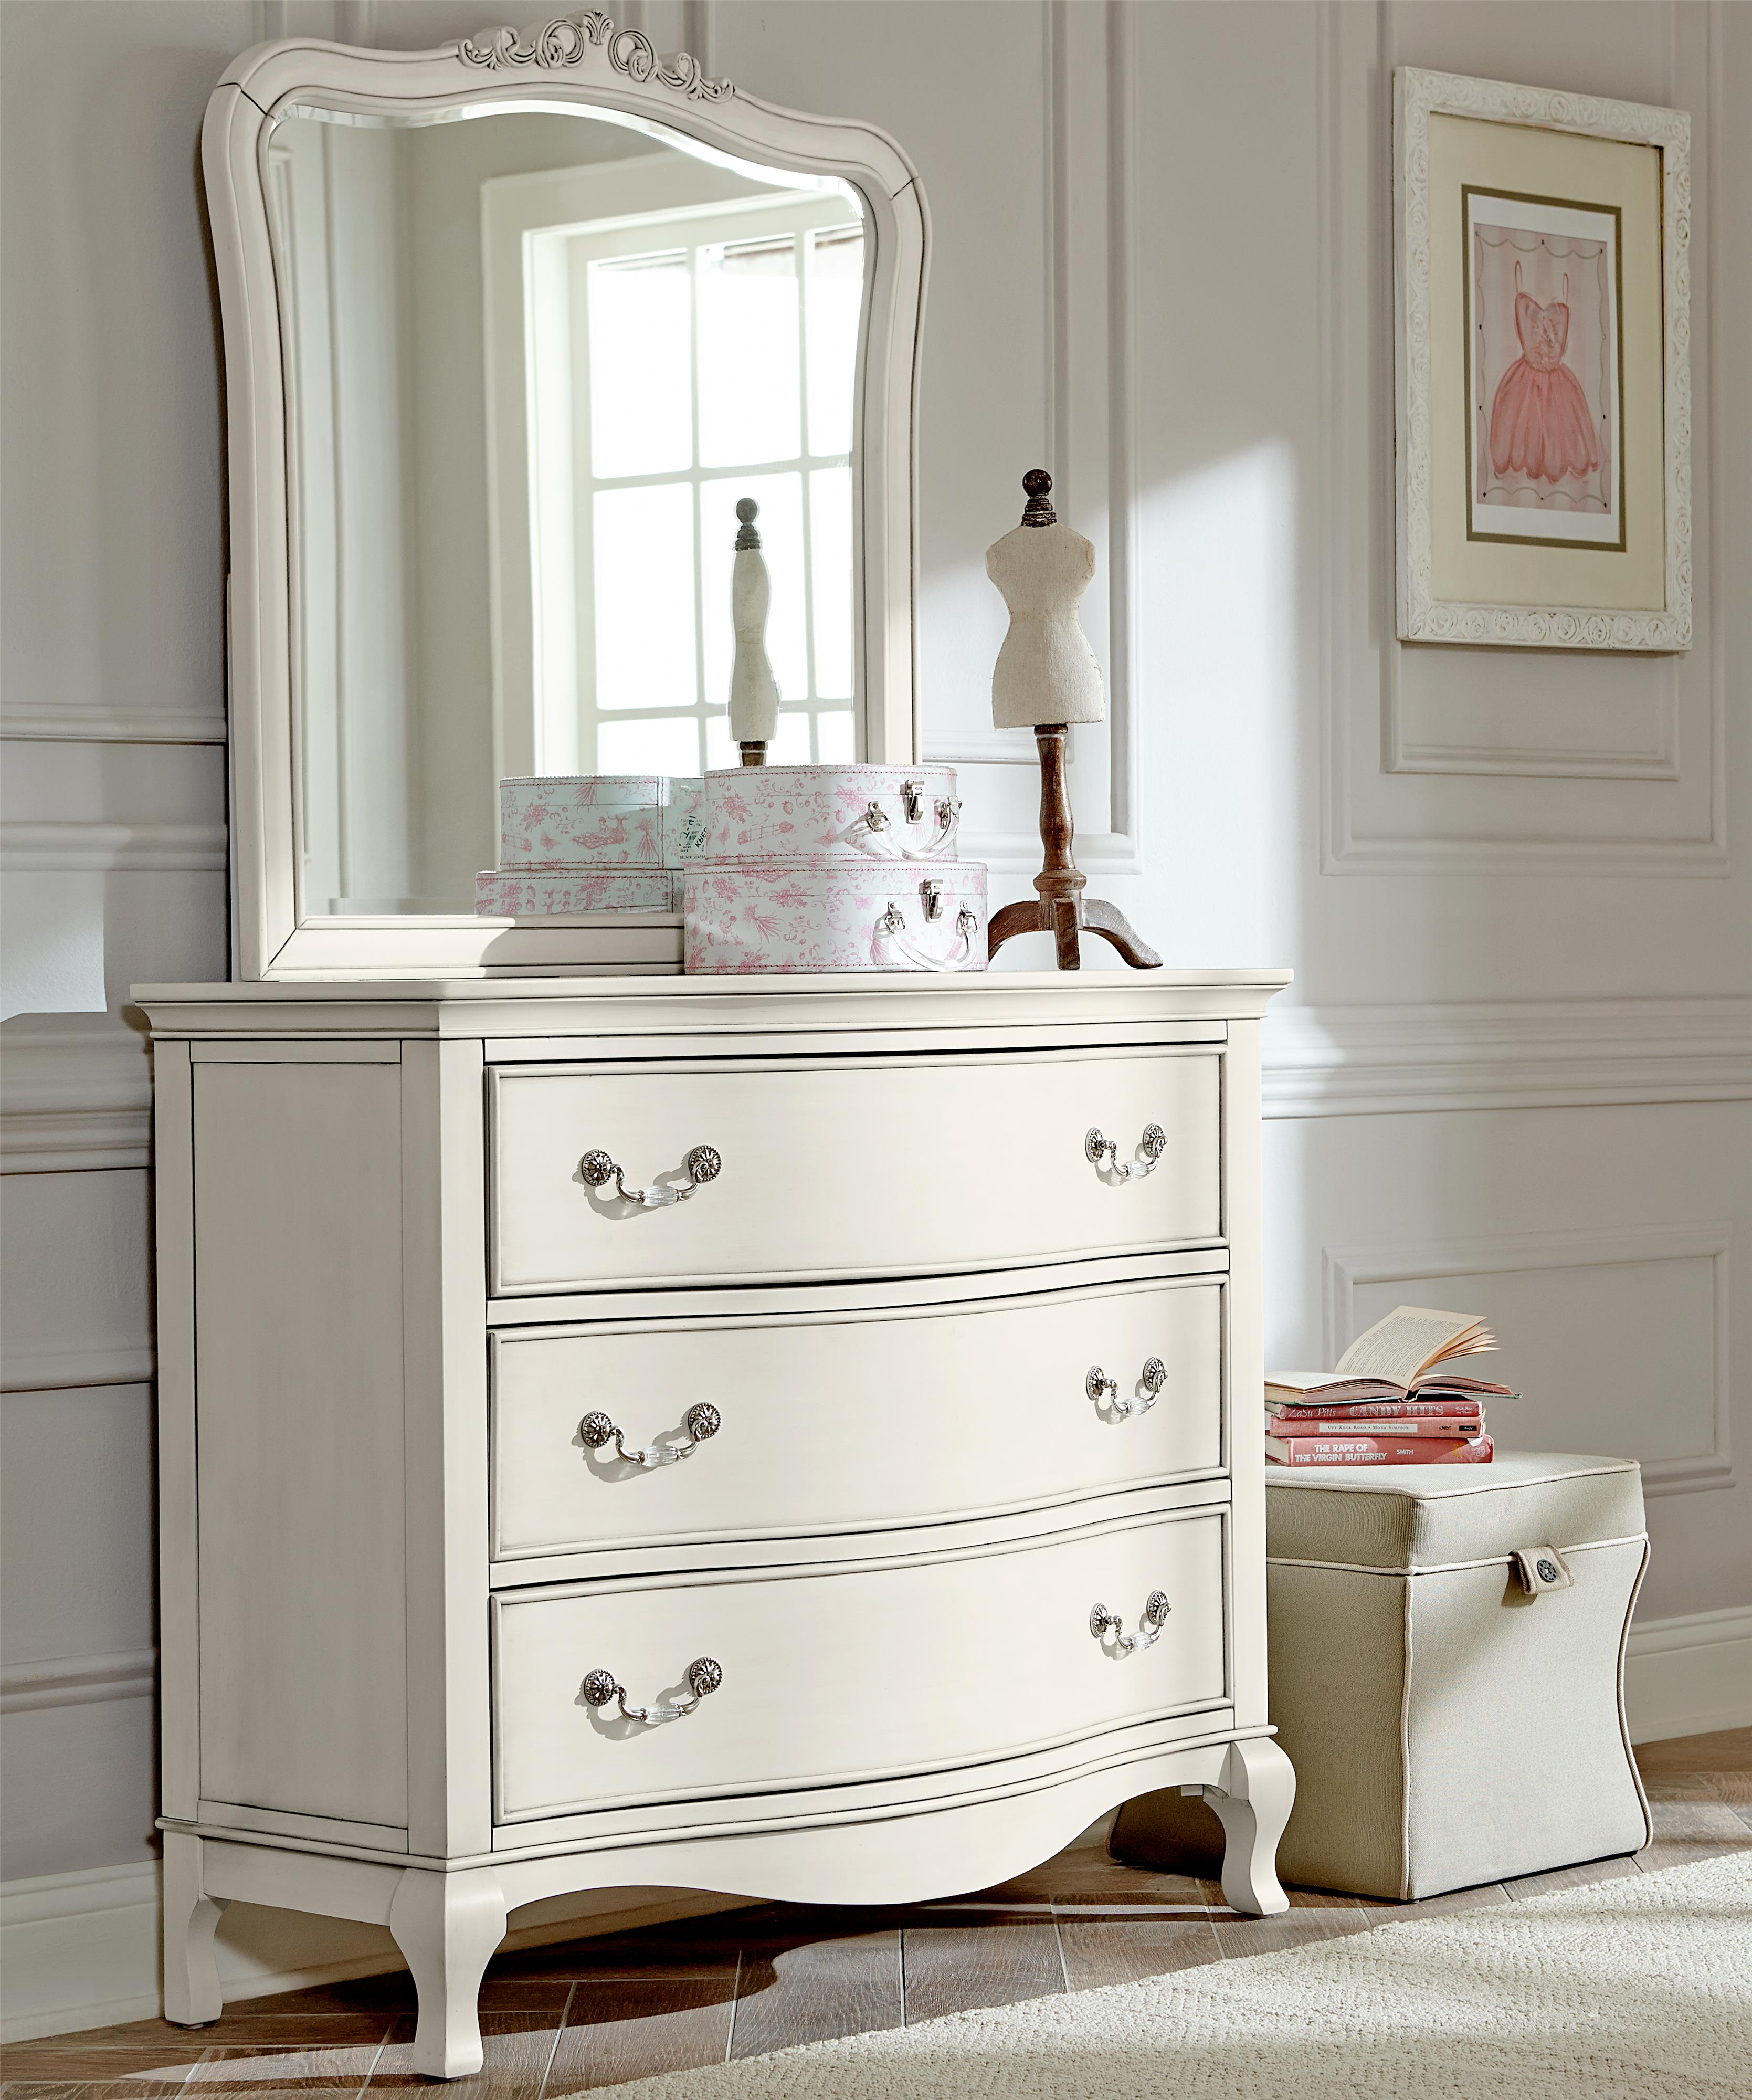 NE Kids Kensington Single Dresser and Mirror Set - Item Number: 20505+10